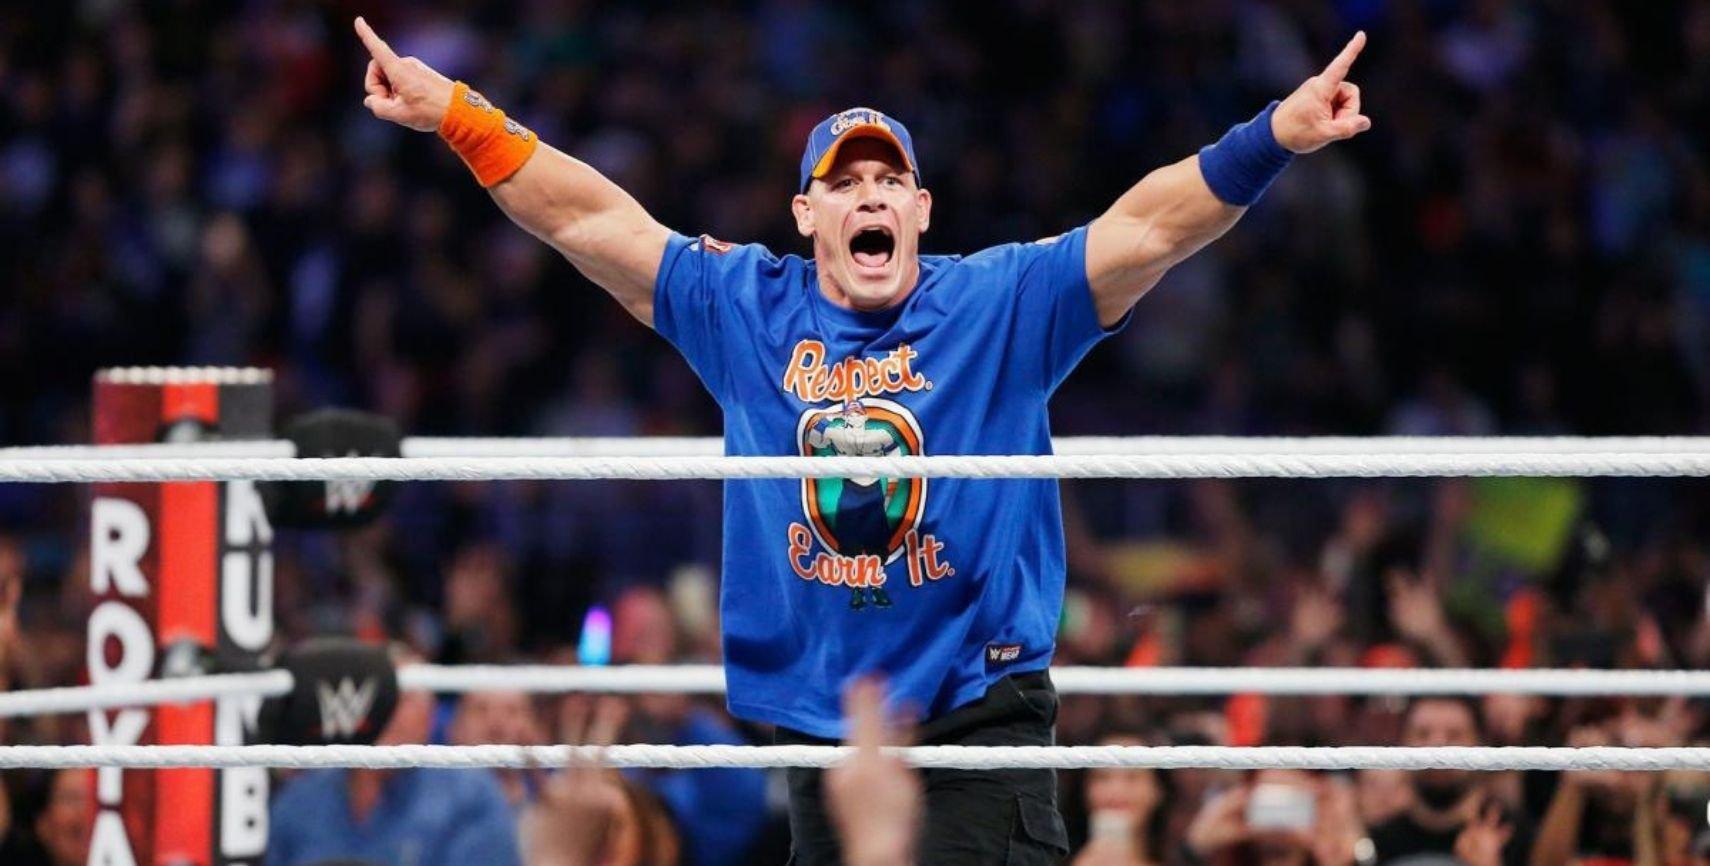 John Cena Could Headline SummerSlam!